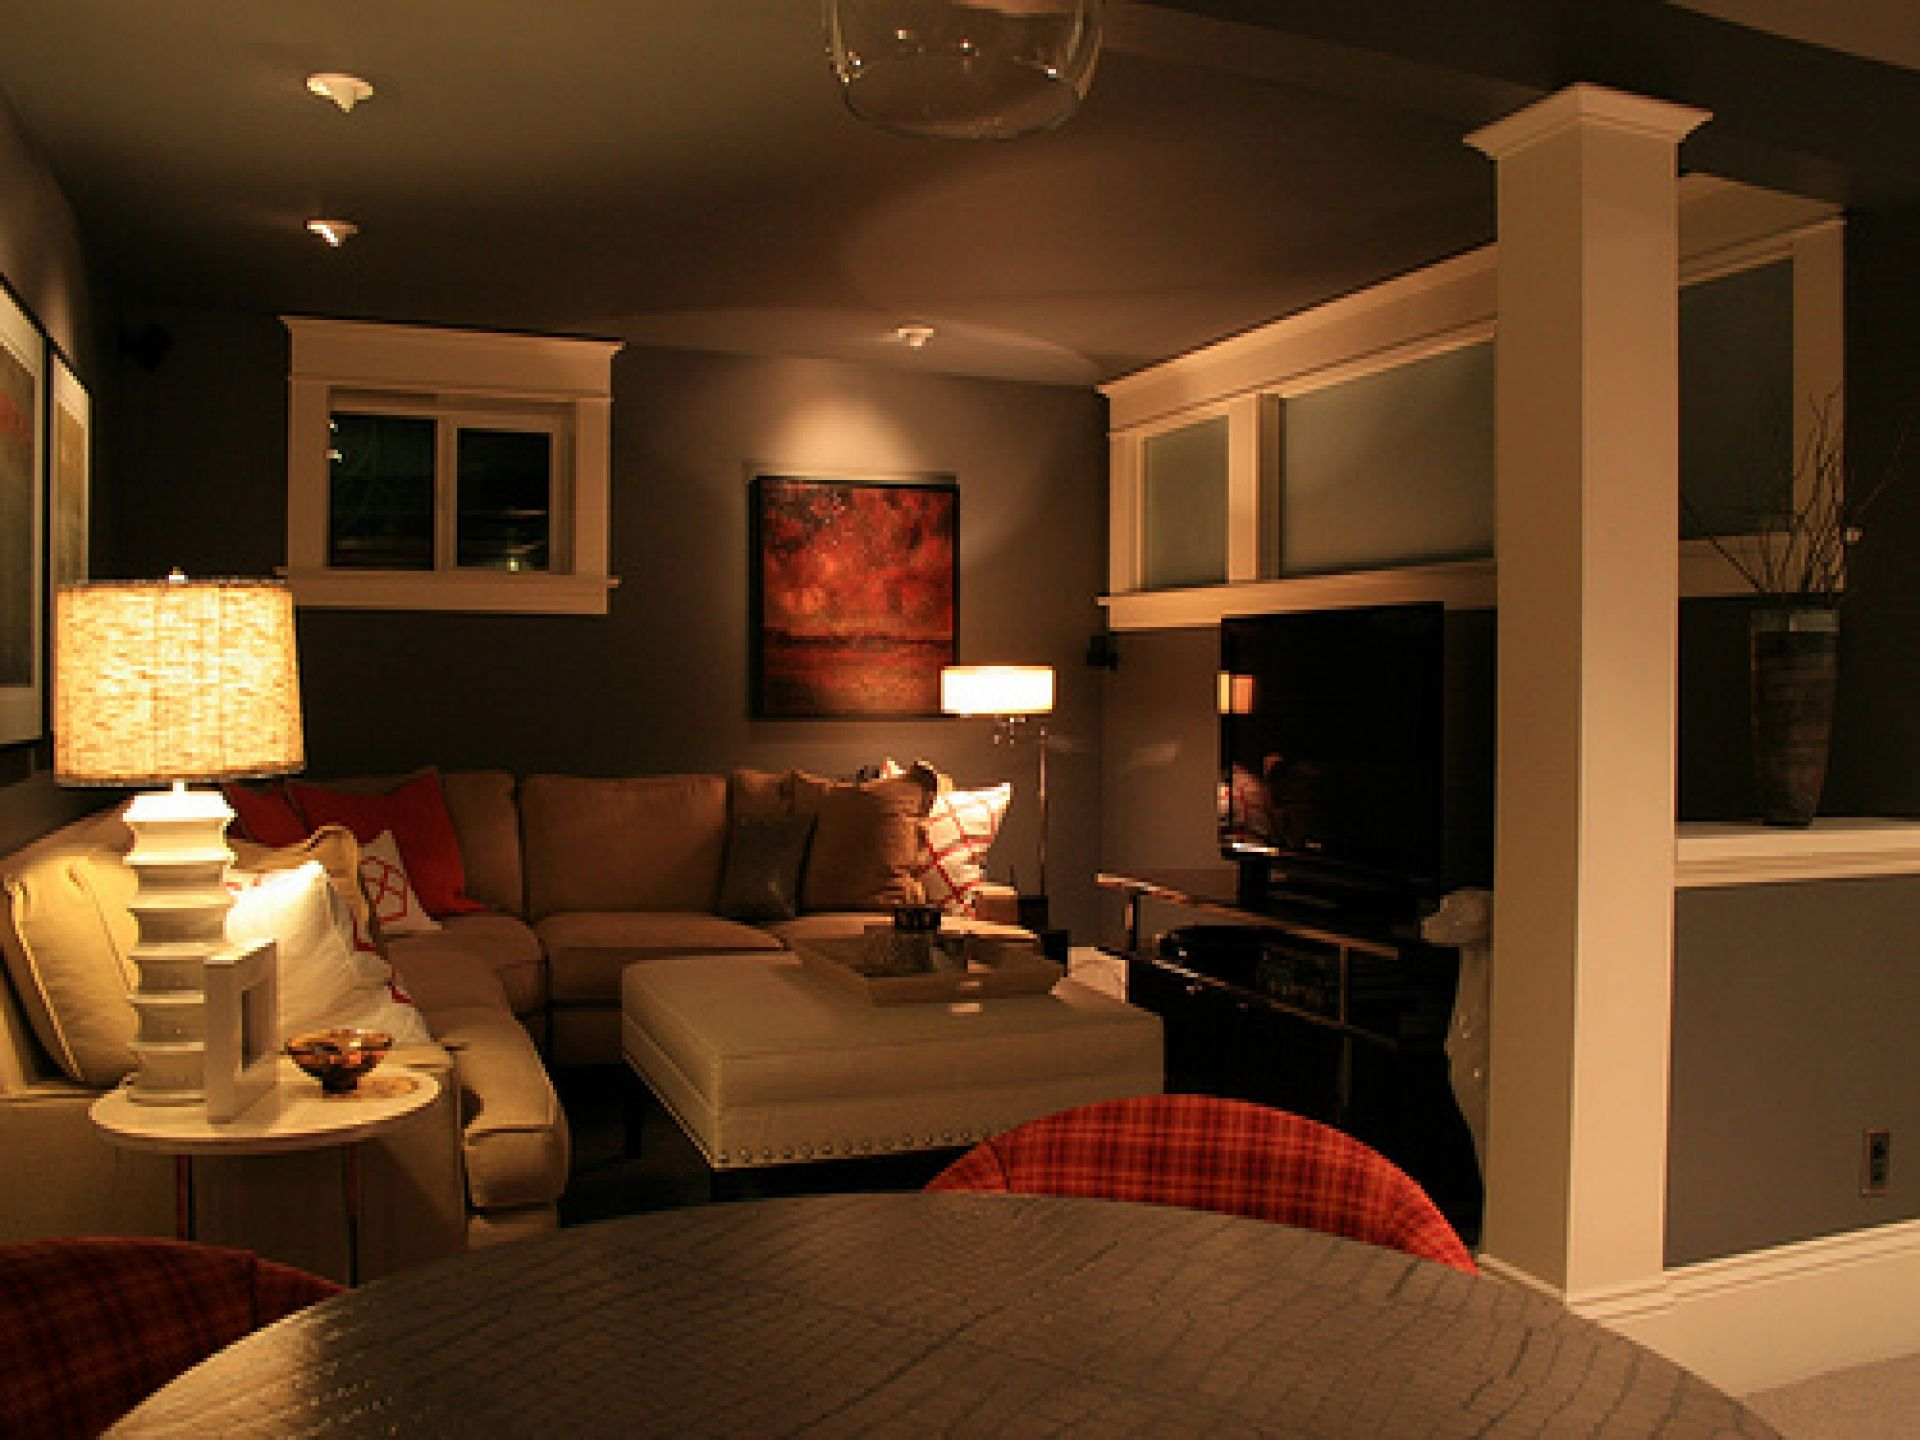 Basement Bedroom Ideas Romantic Cozy Basement Home Home Decor